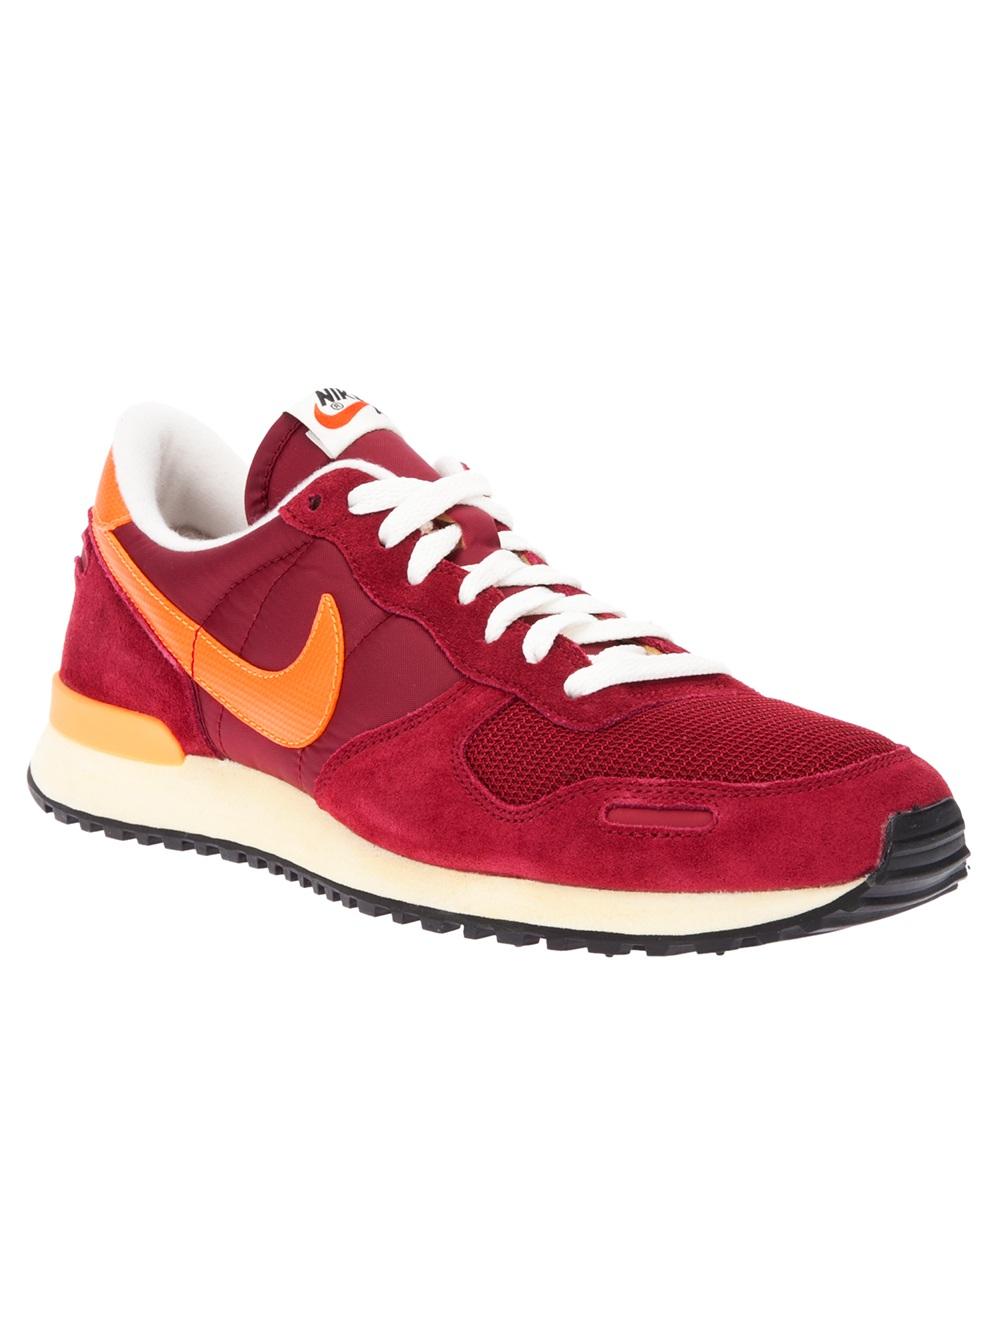 In Vortex Red Men For Lyst Sneaker Nike Air Vintage EnXFaq